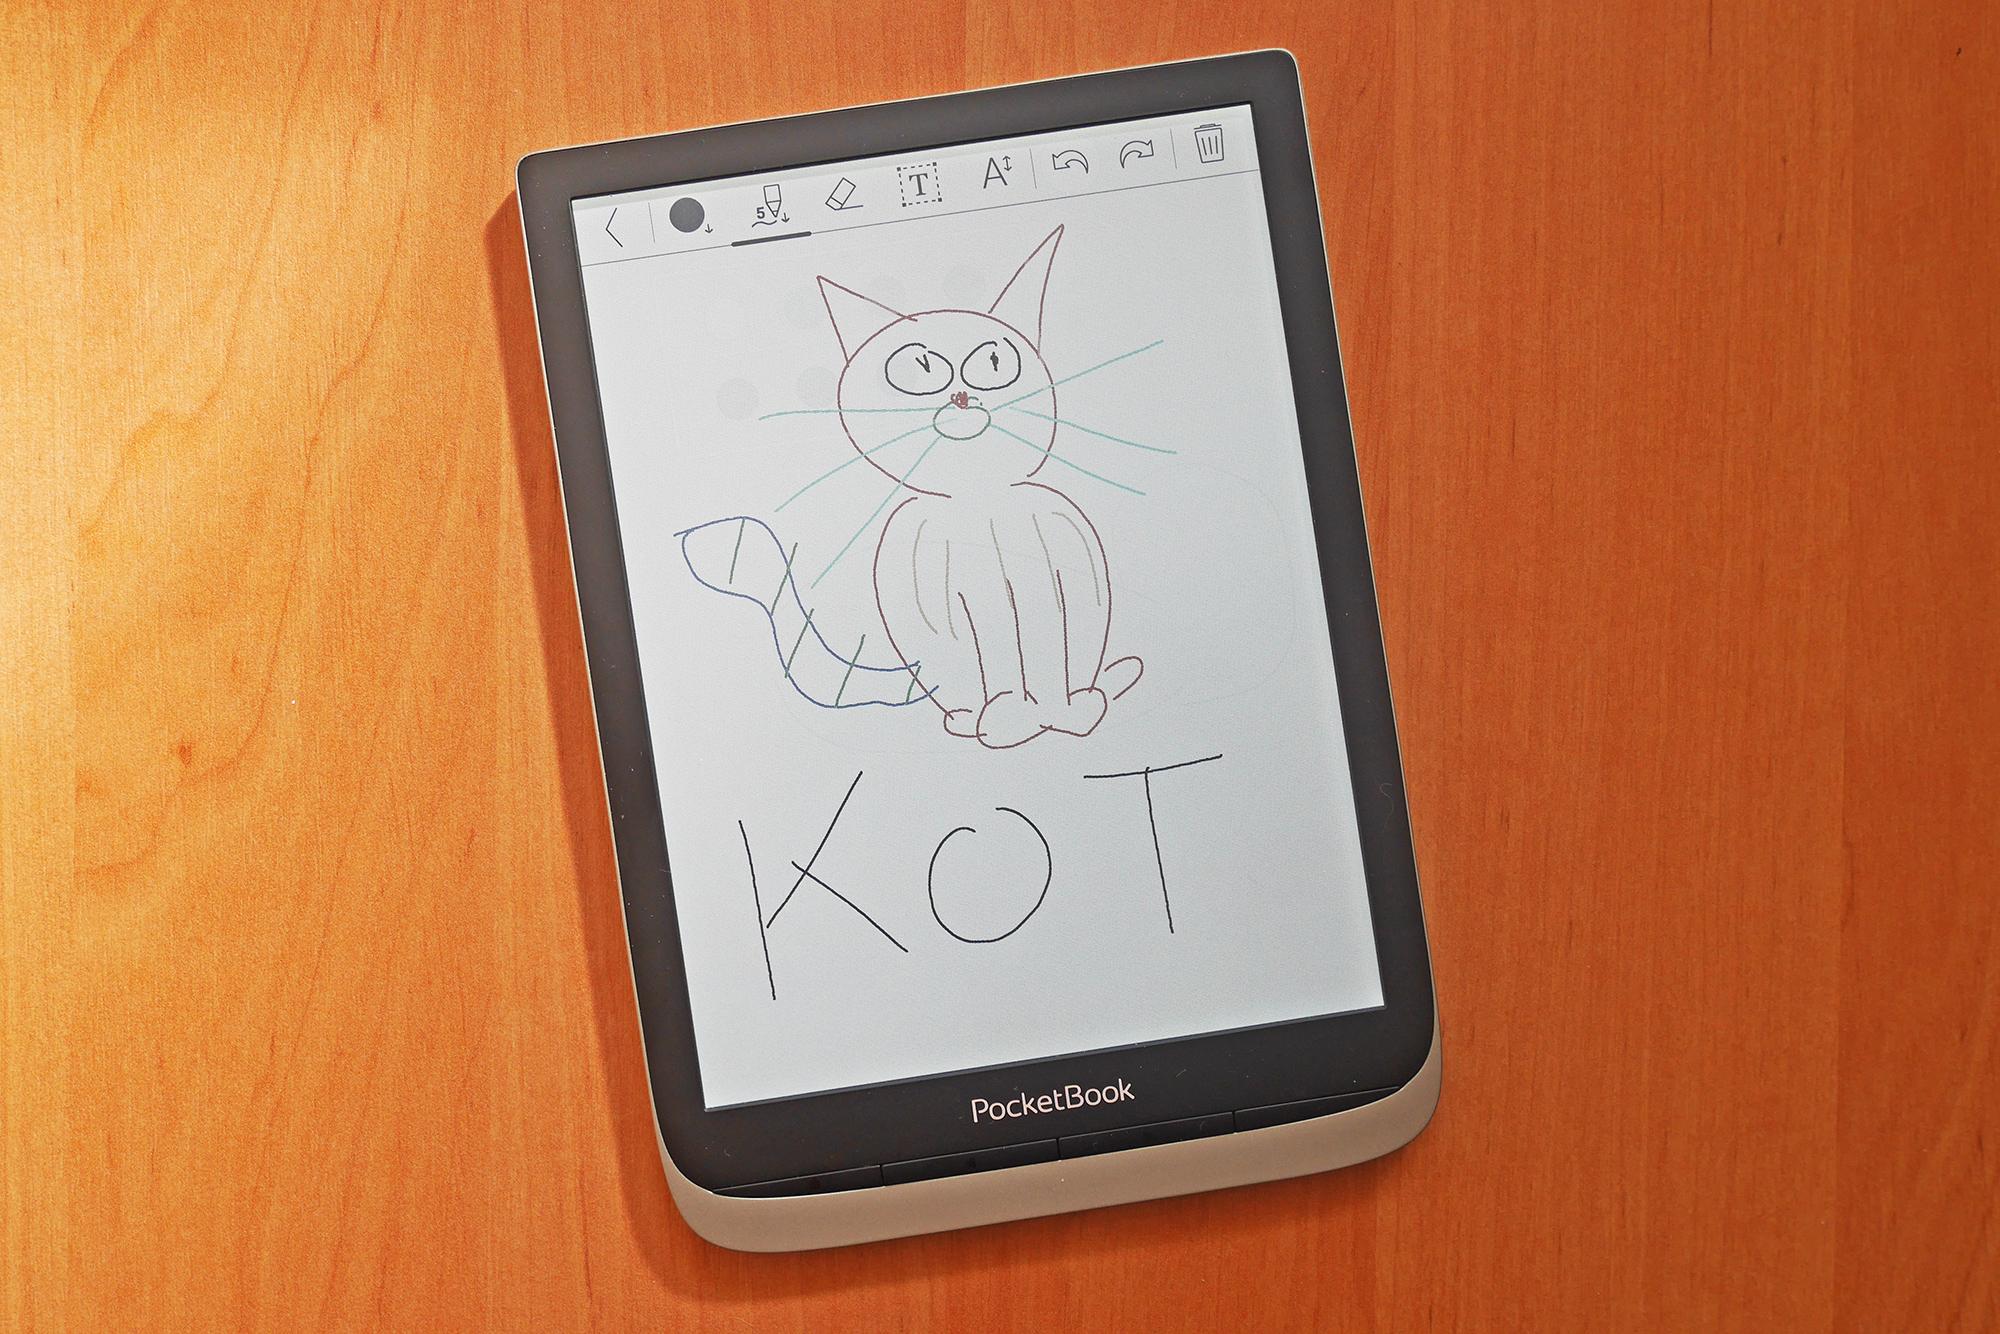 PocketBook 740 Color - •Wi-Fi, Bluetooth